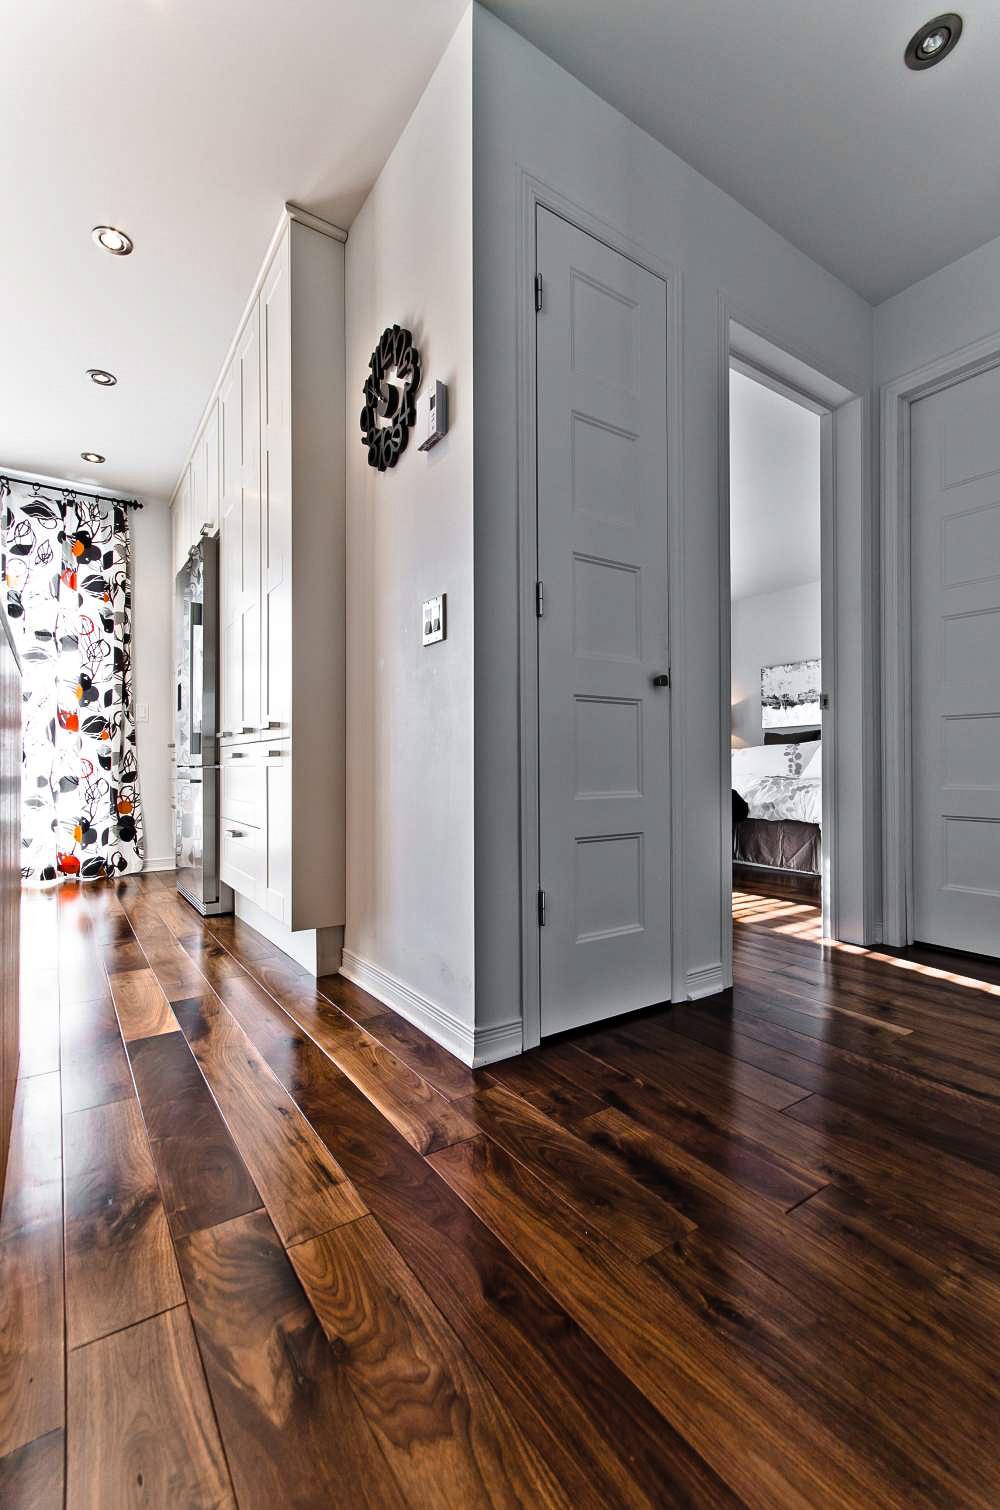 plancher-noyer-noir-5-po-authentique-6.jpg